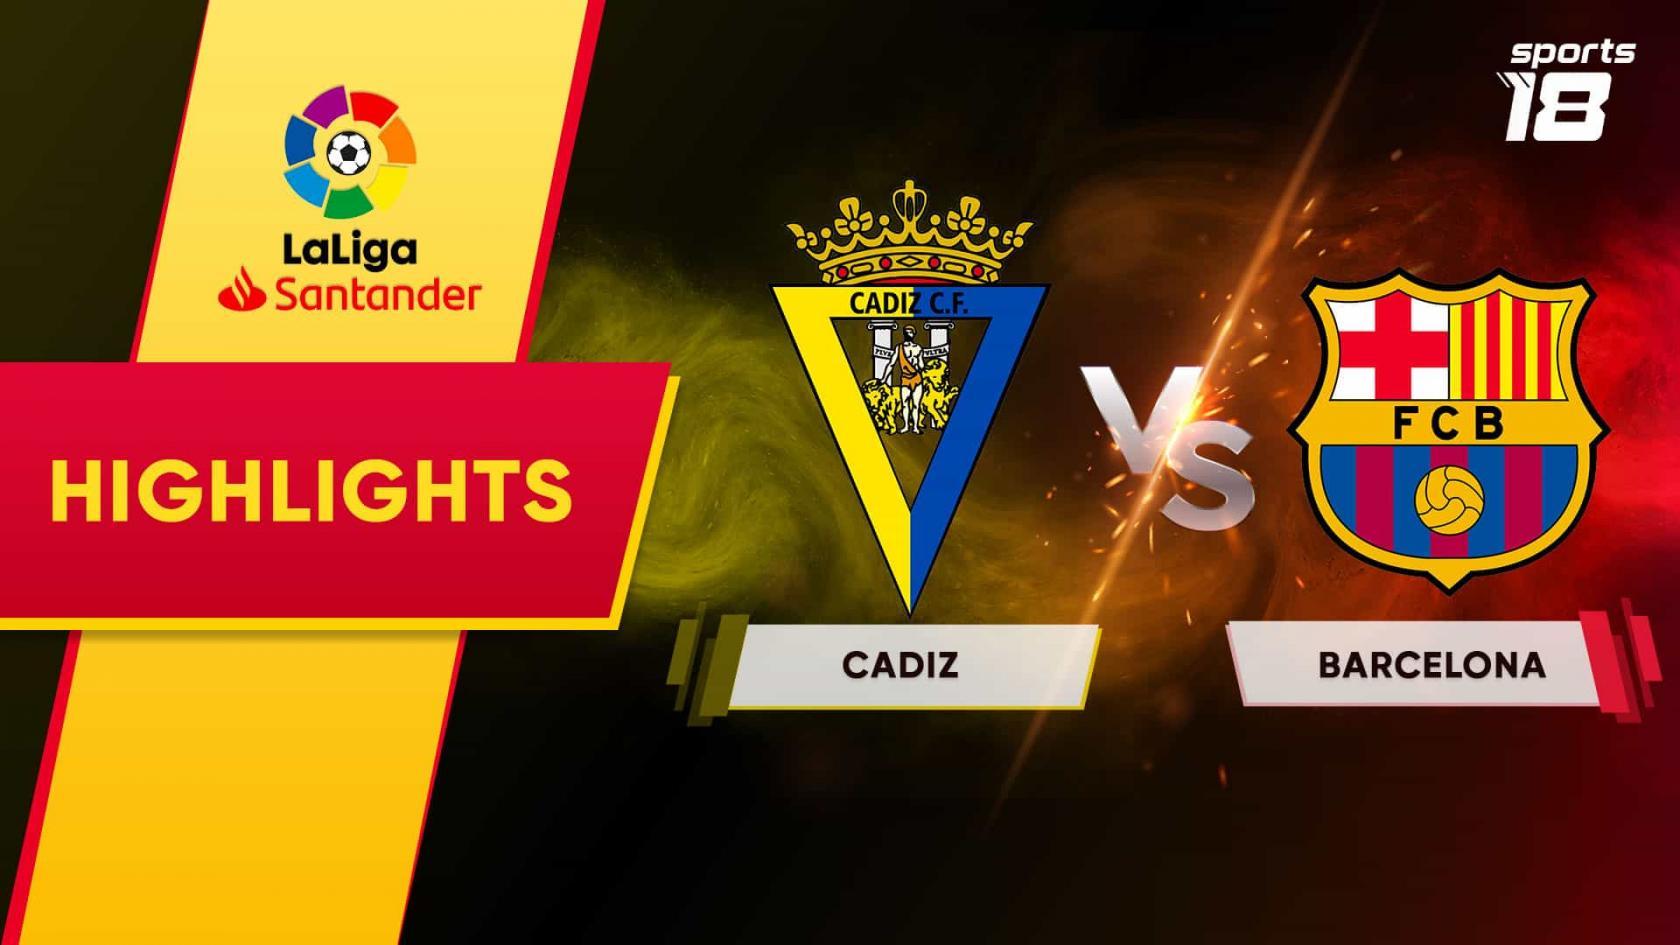 cadiz vs barcelona hd for free on